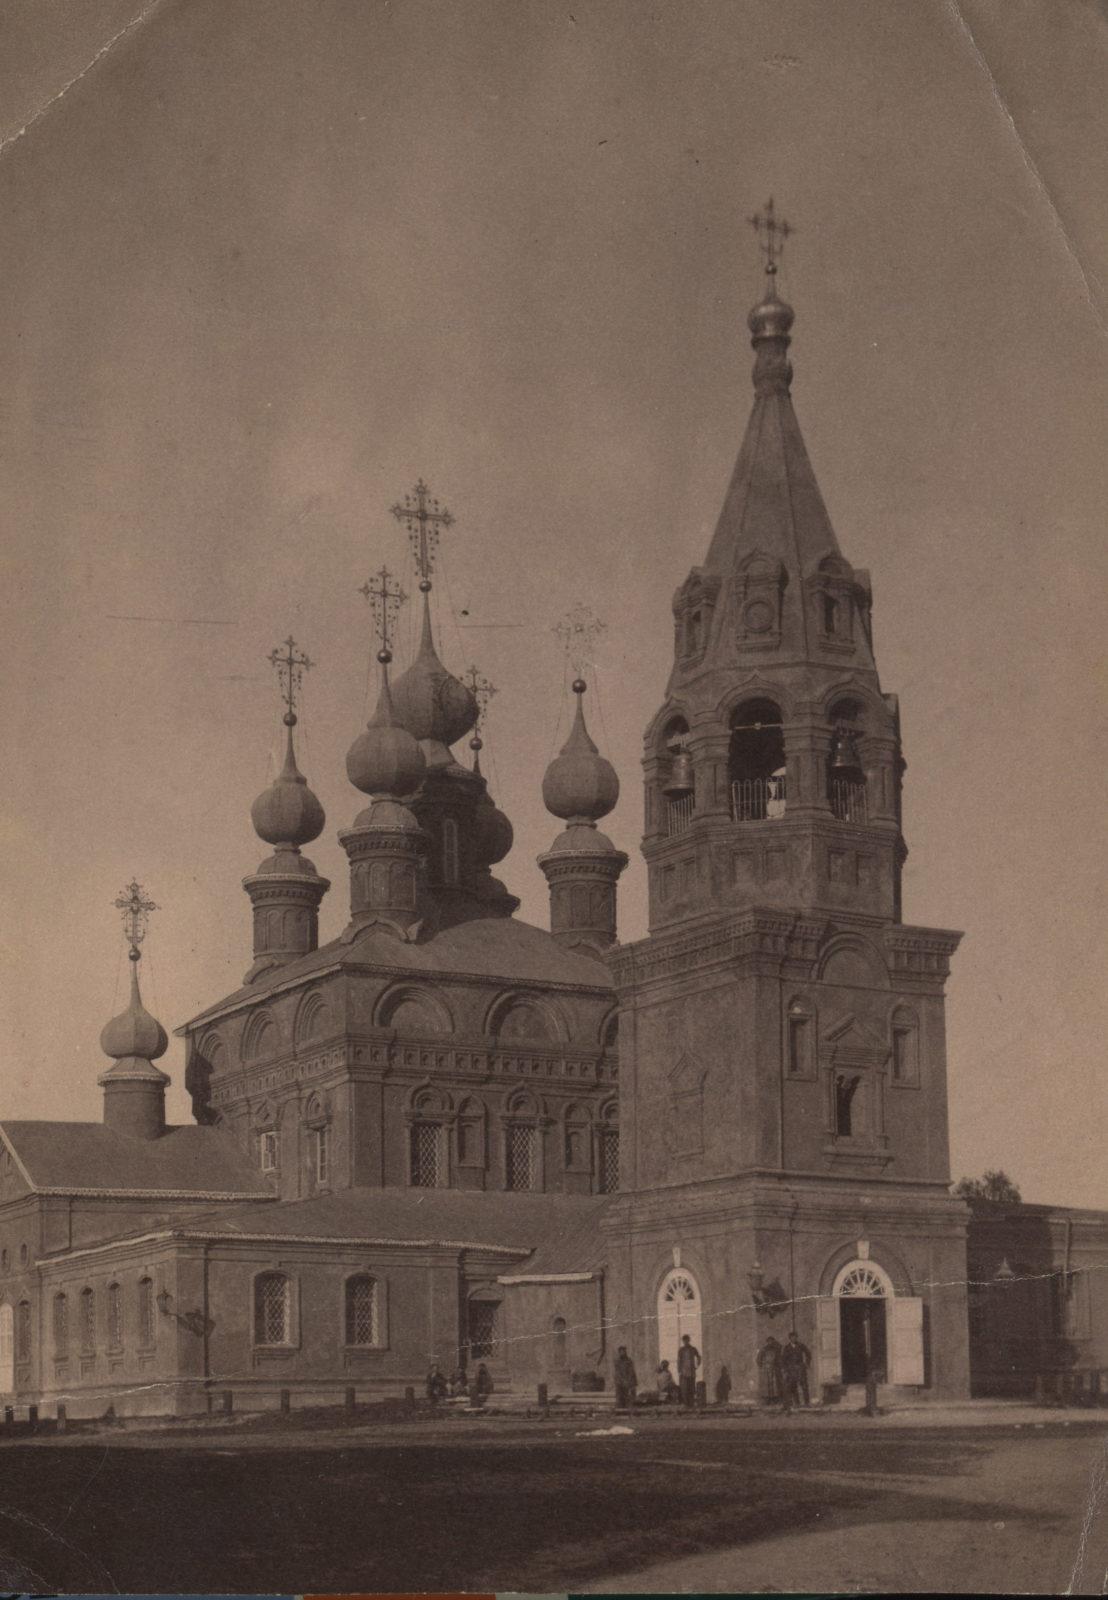 Nikolo-Mozhaisk church. Murom, Vladimir Province, Russia